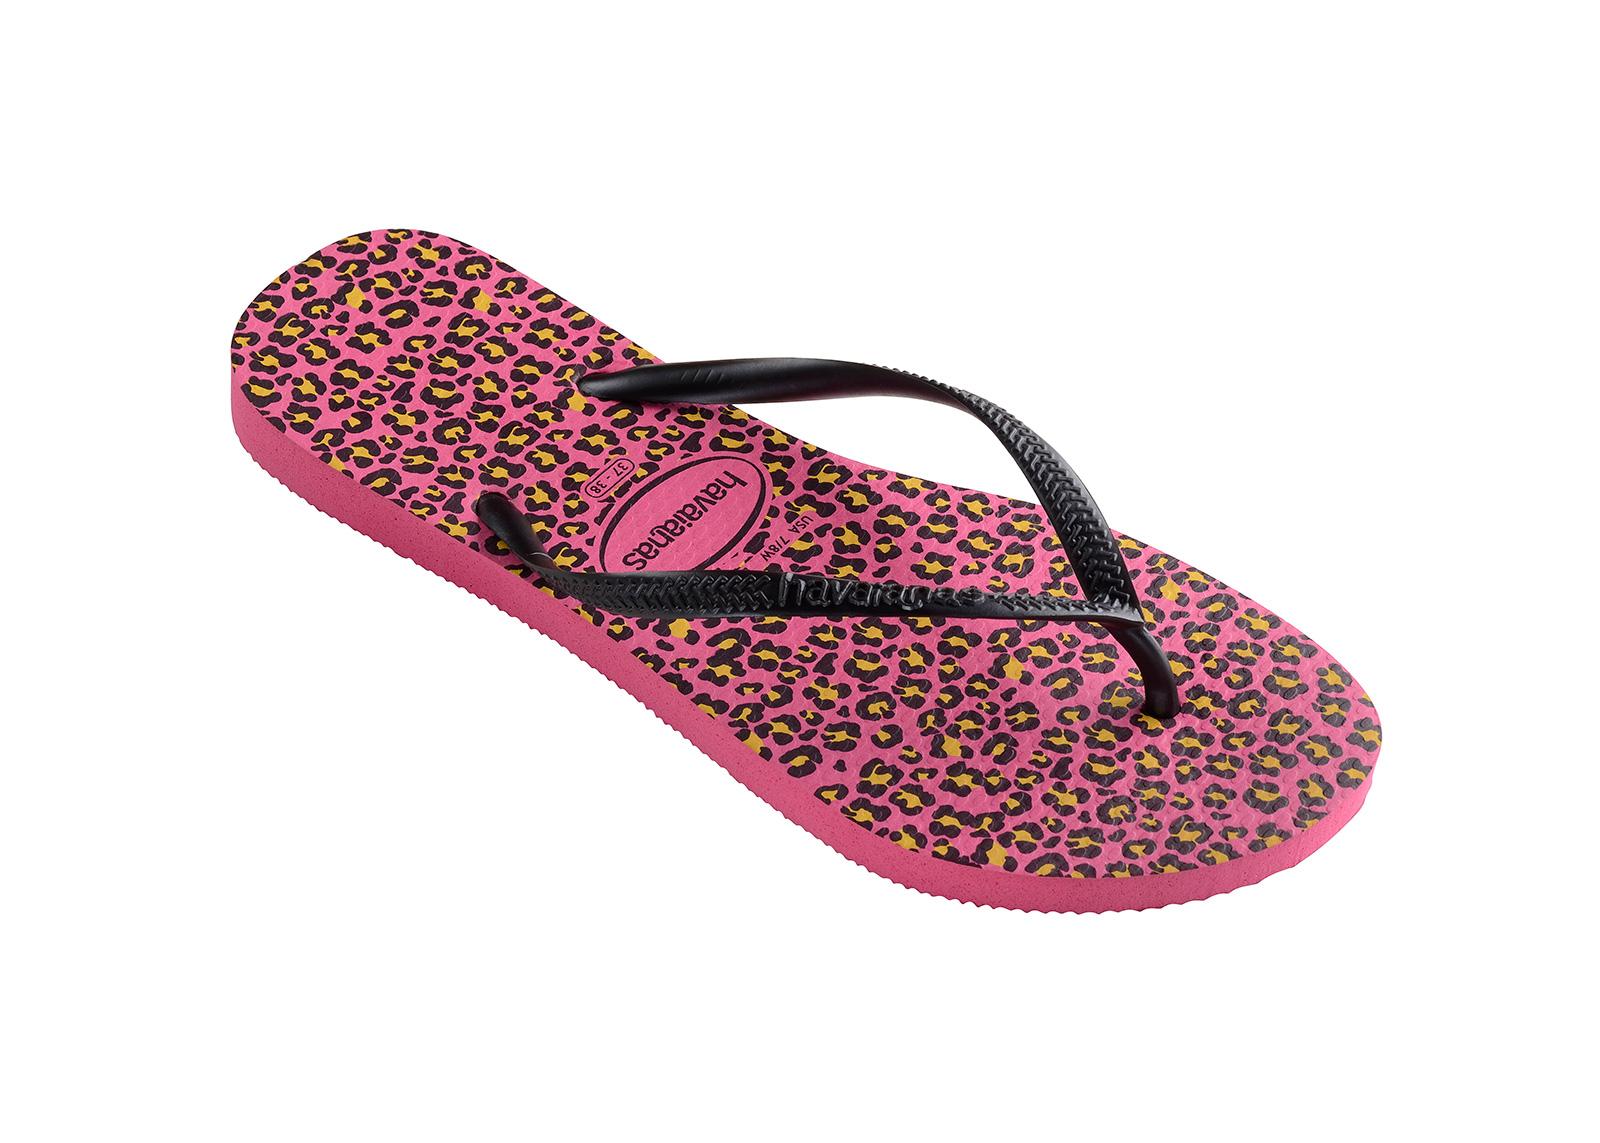 Flip-Flops Flip-Flops - Havaianas Slim Animals Shocking Pink-5102